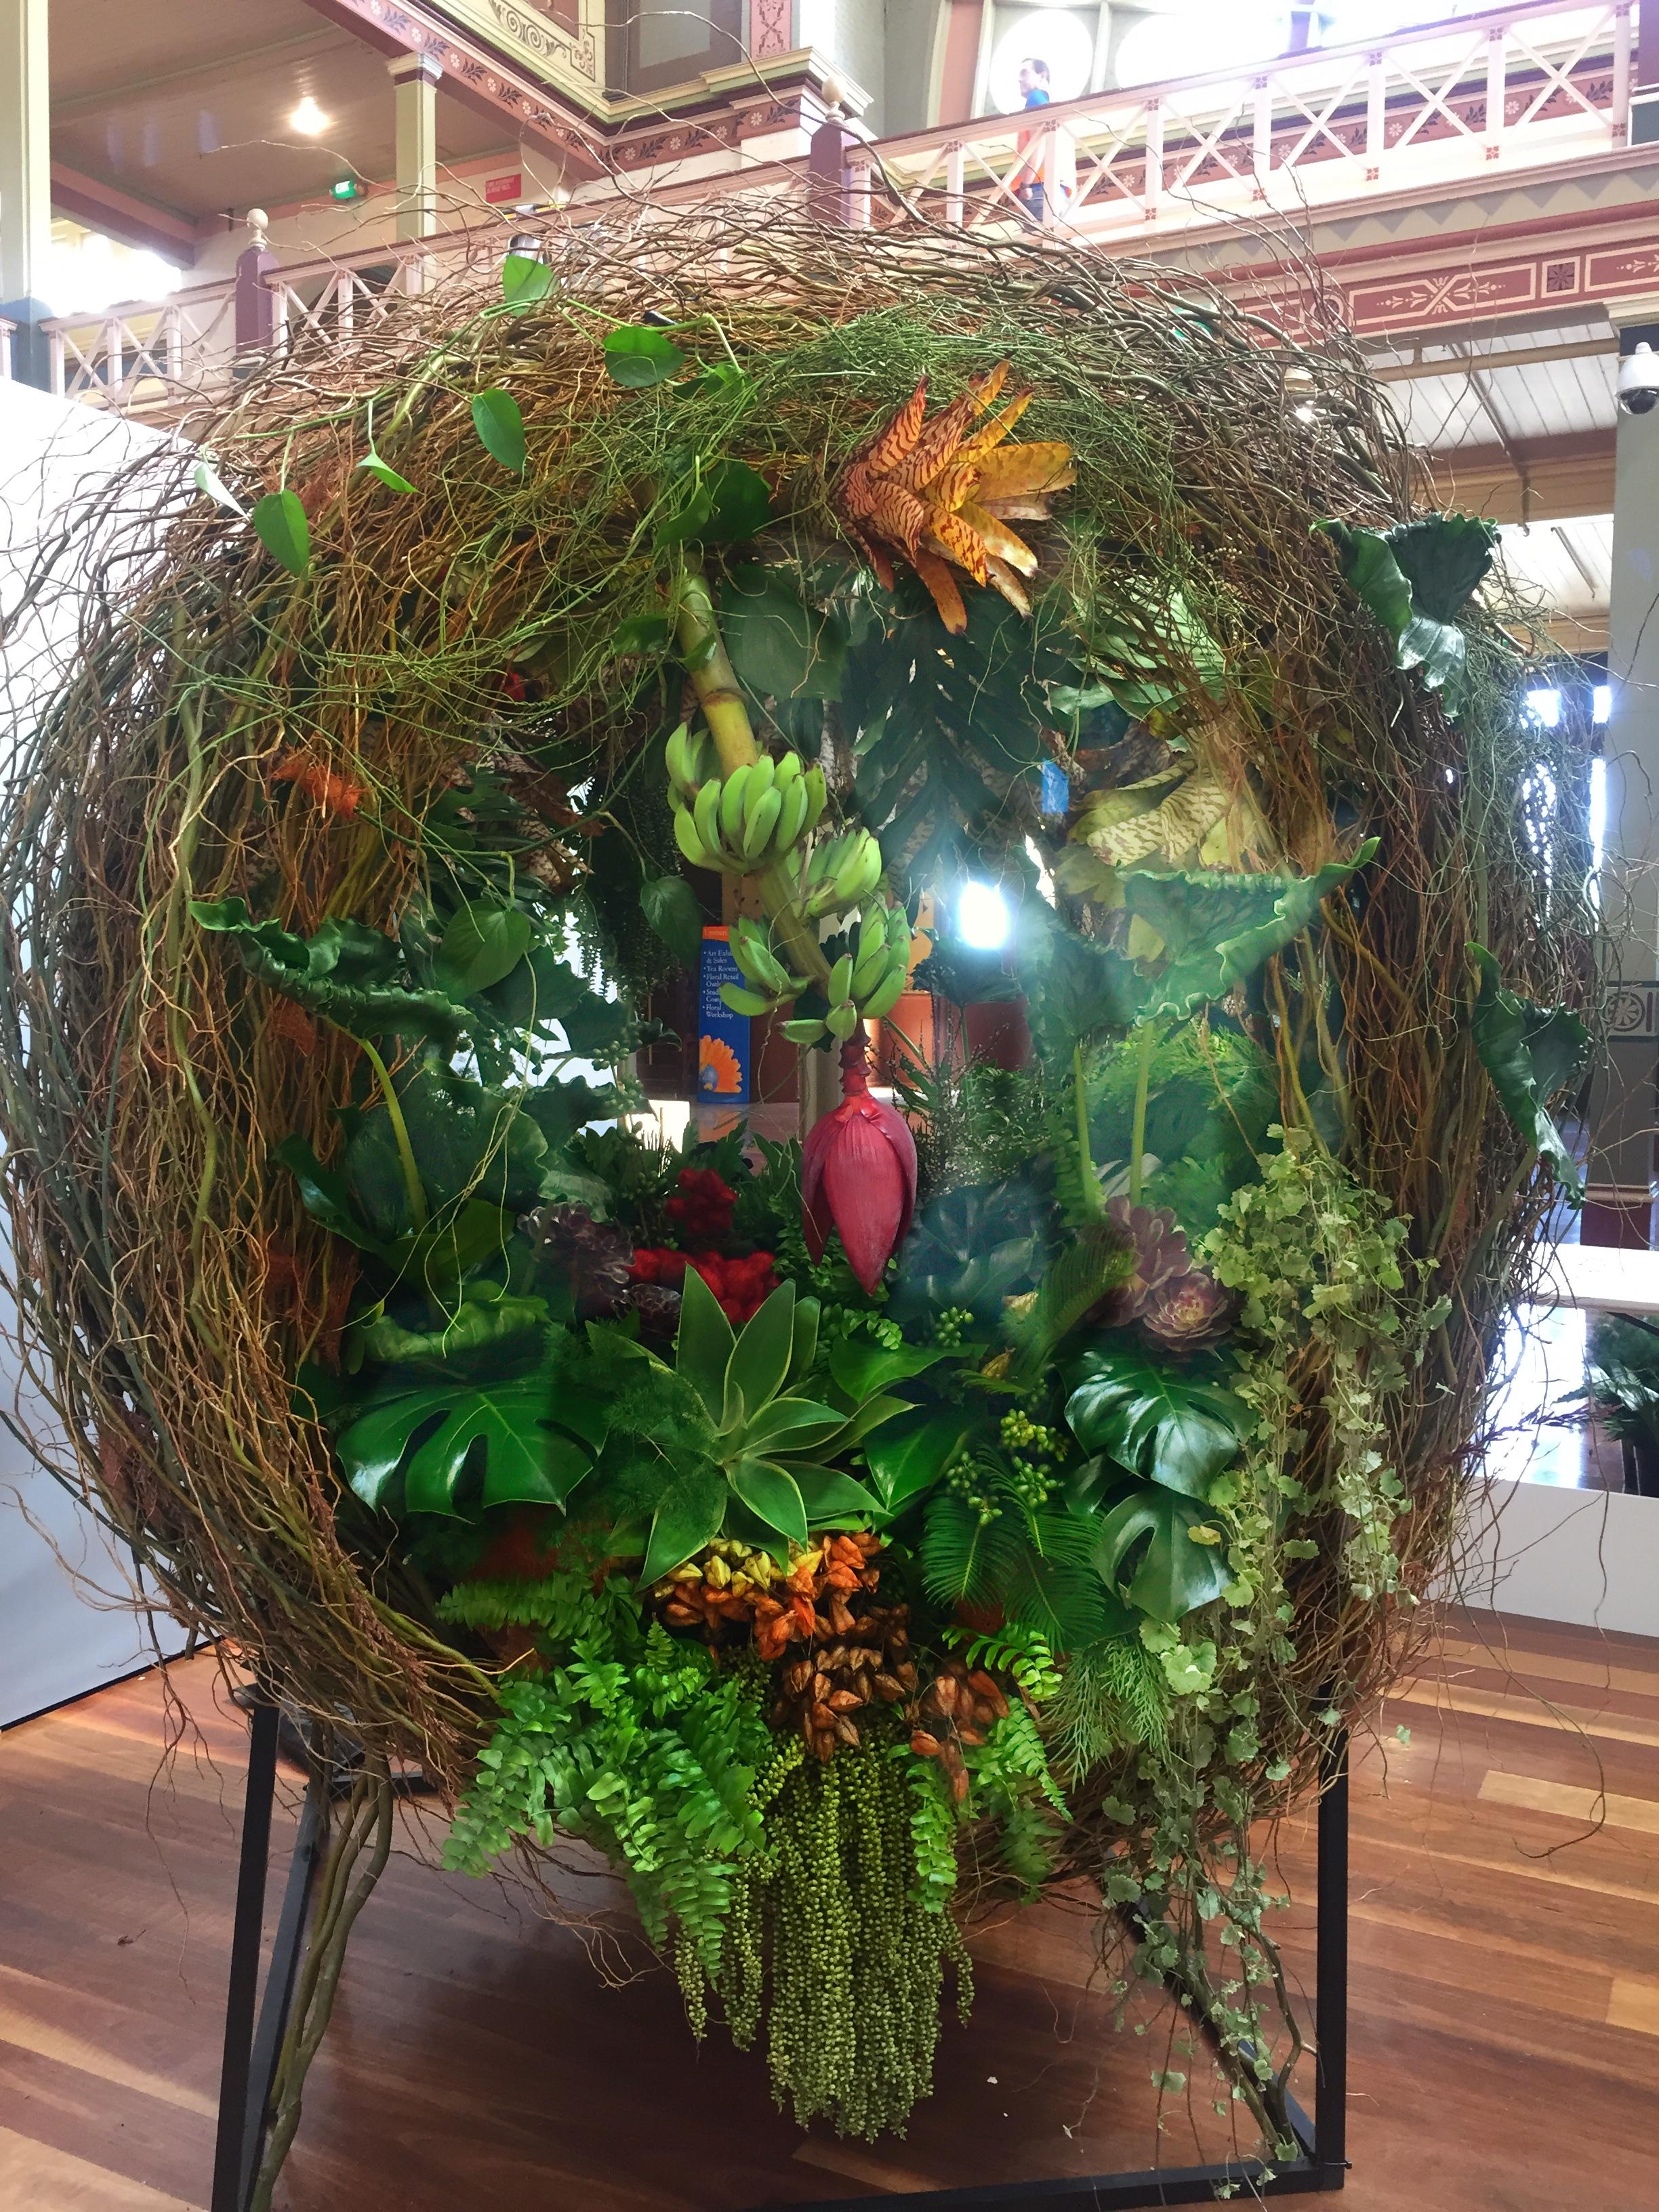 2017 melbourne international flower and garden show | bloom college